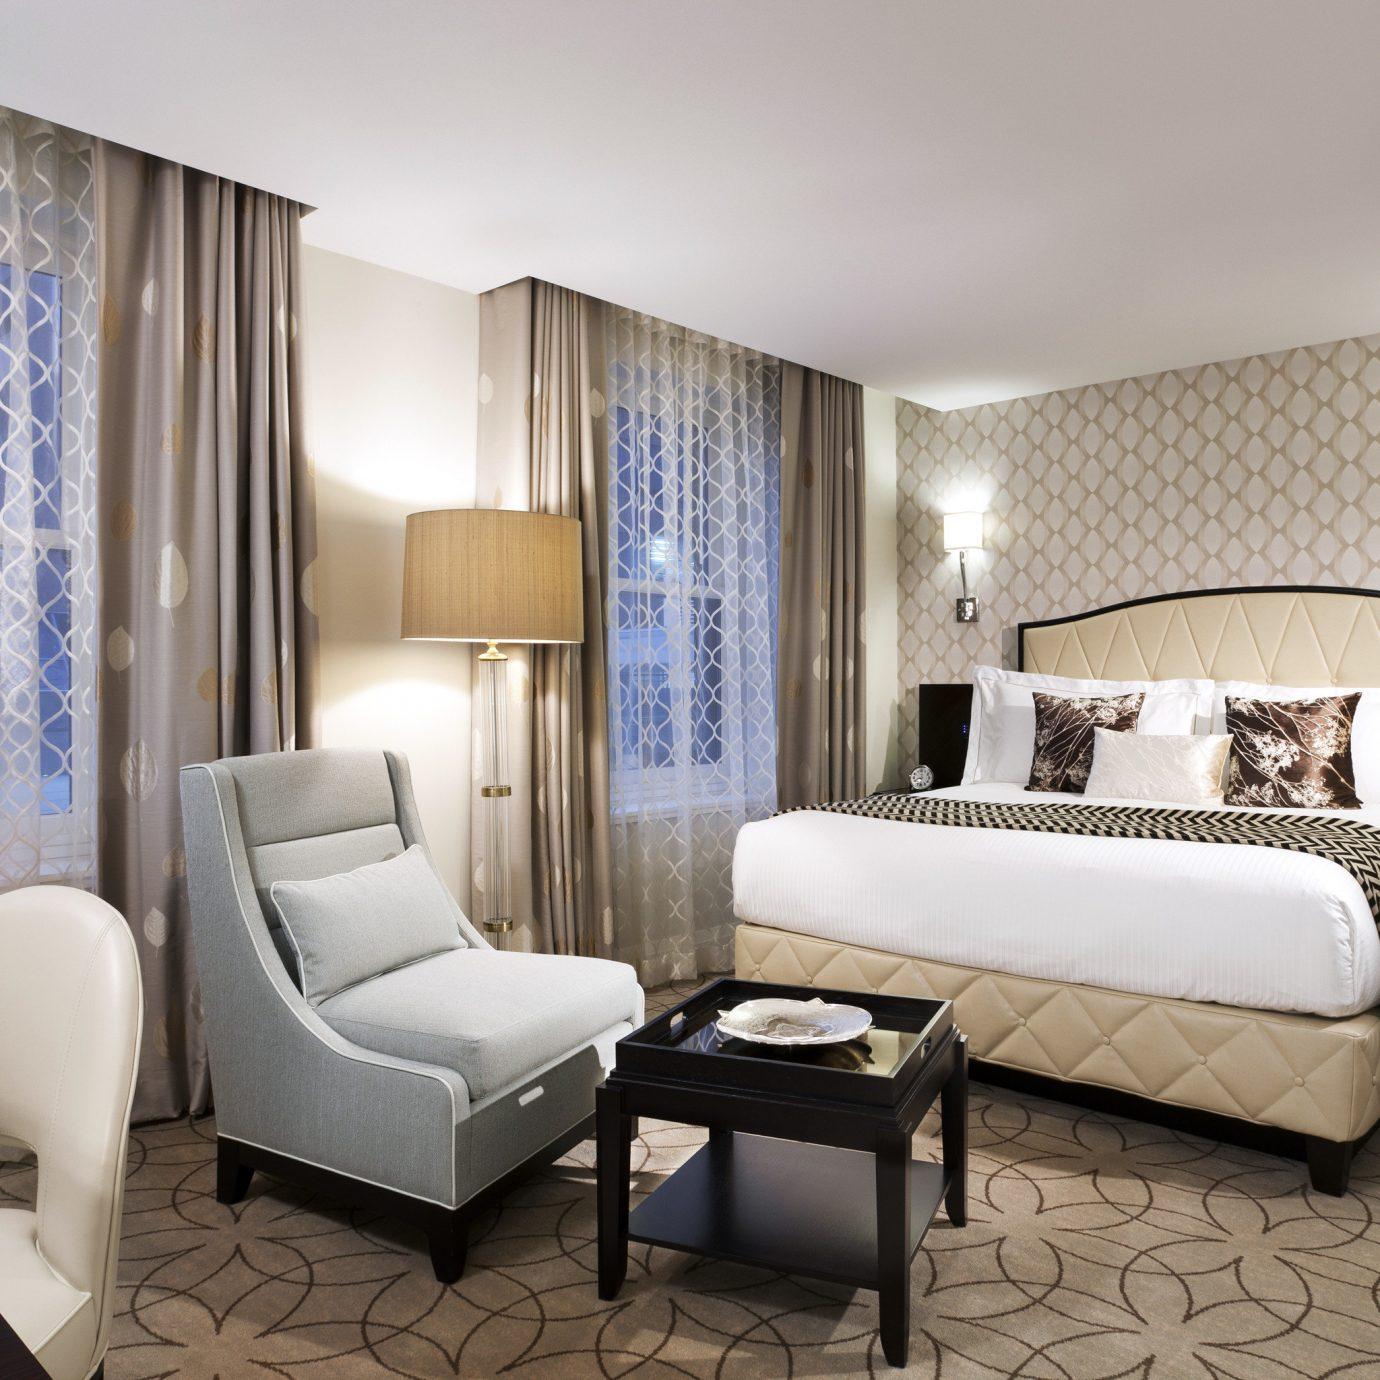 Bedroom City Elegant Hotels Modern Trip Ideas property Suite living room condominium home